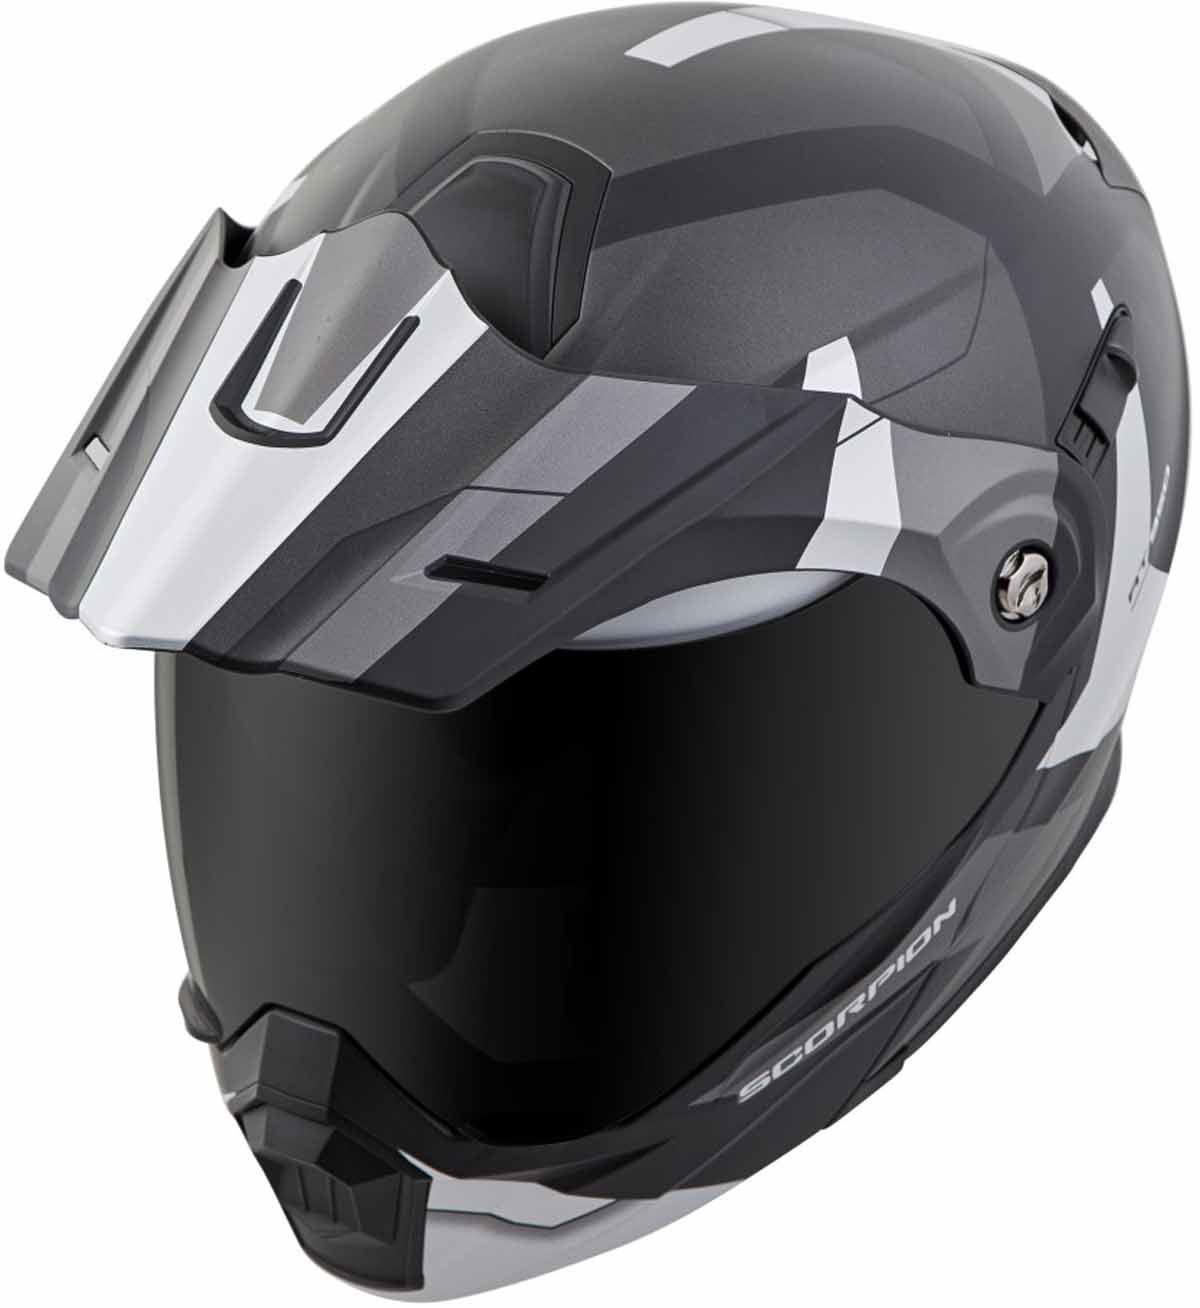 Scorpion-EXO-AT950-Helmet-Flip-Up-Modular-Dual-Sport-Adventure-ADV-DOT-XS-3XL miniature 33